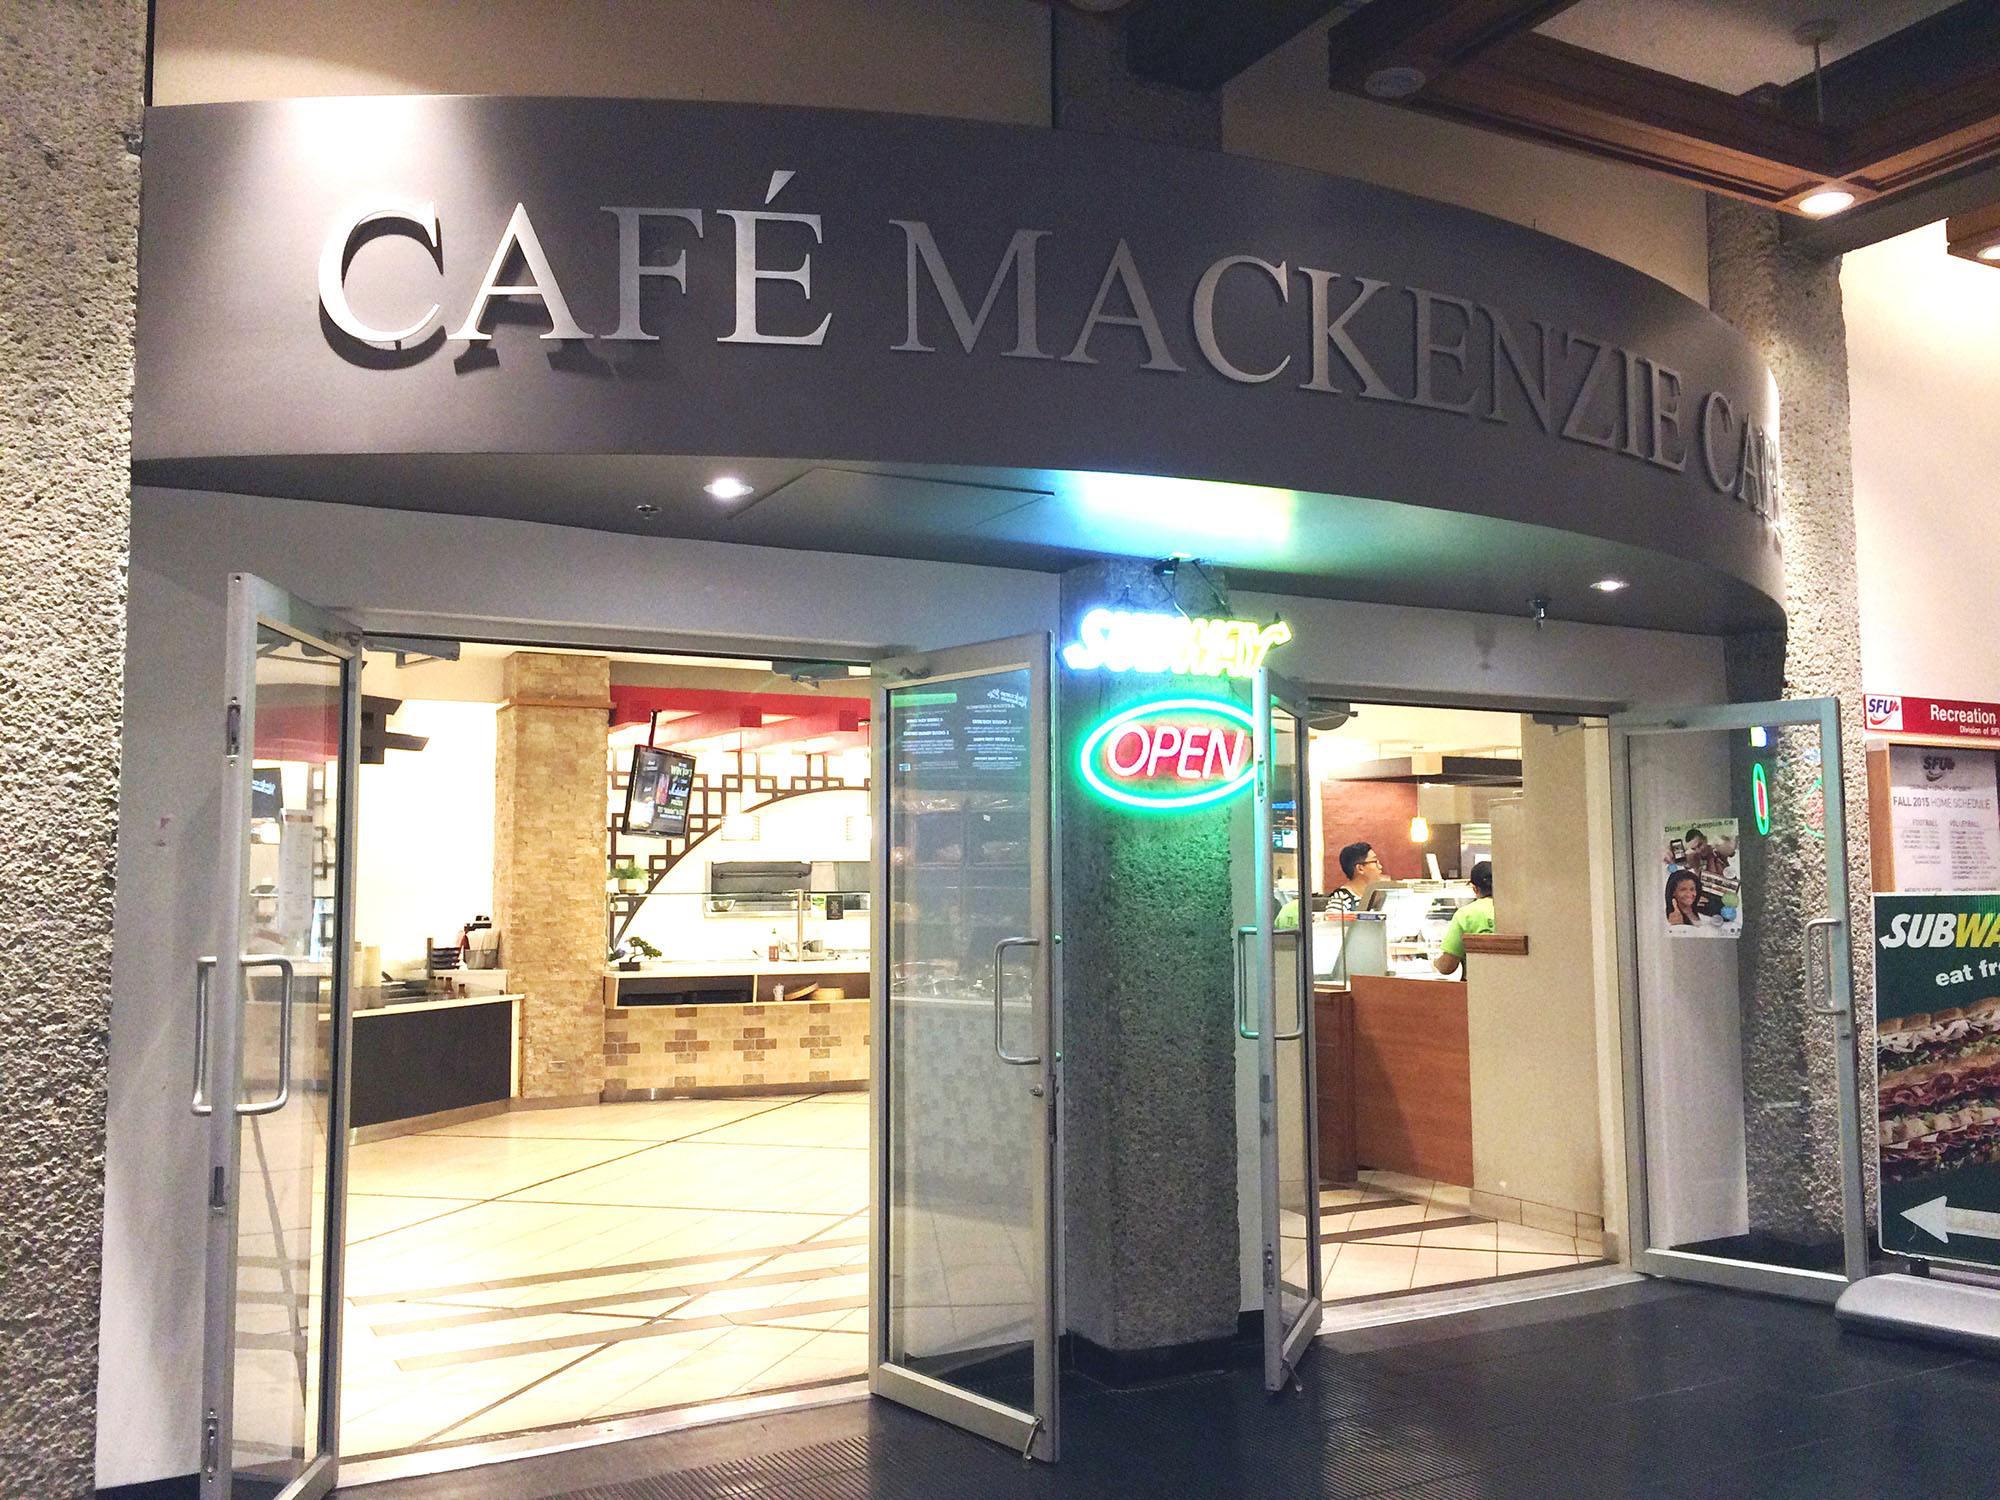 Mackenzie Cafe at SFU (SFU)